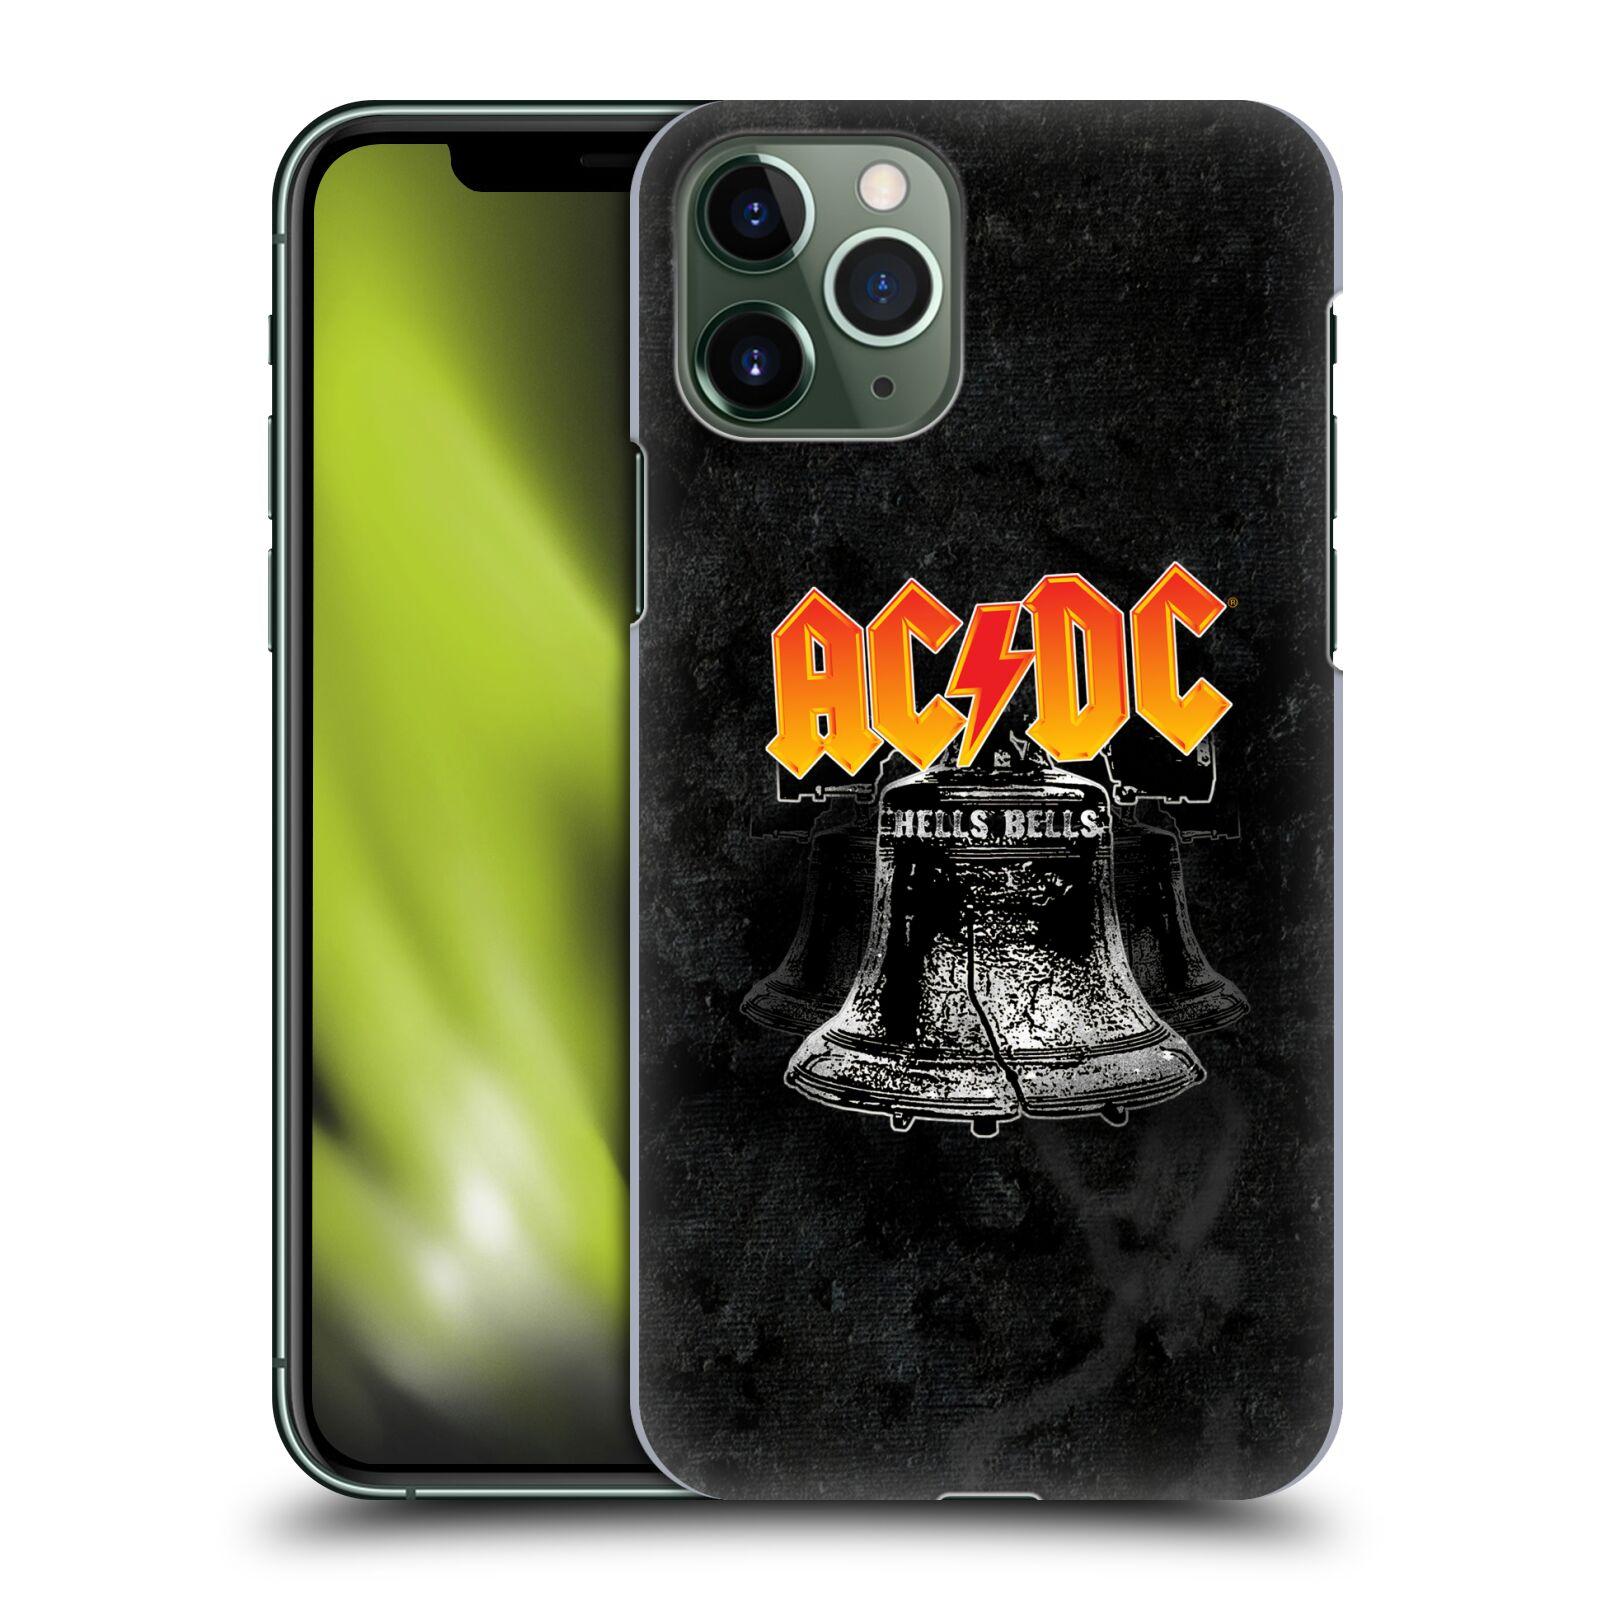 Plastové pouzdro na mobil Apple iPhone 11 Pro - Head Case - AC/DC Hells Bells